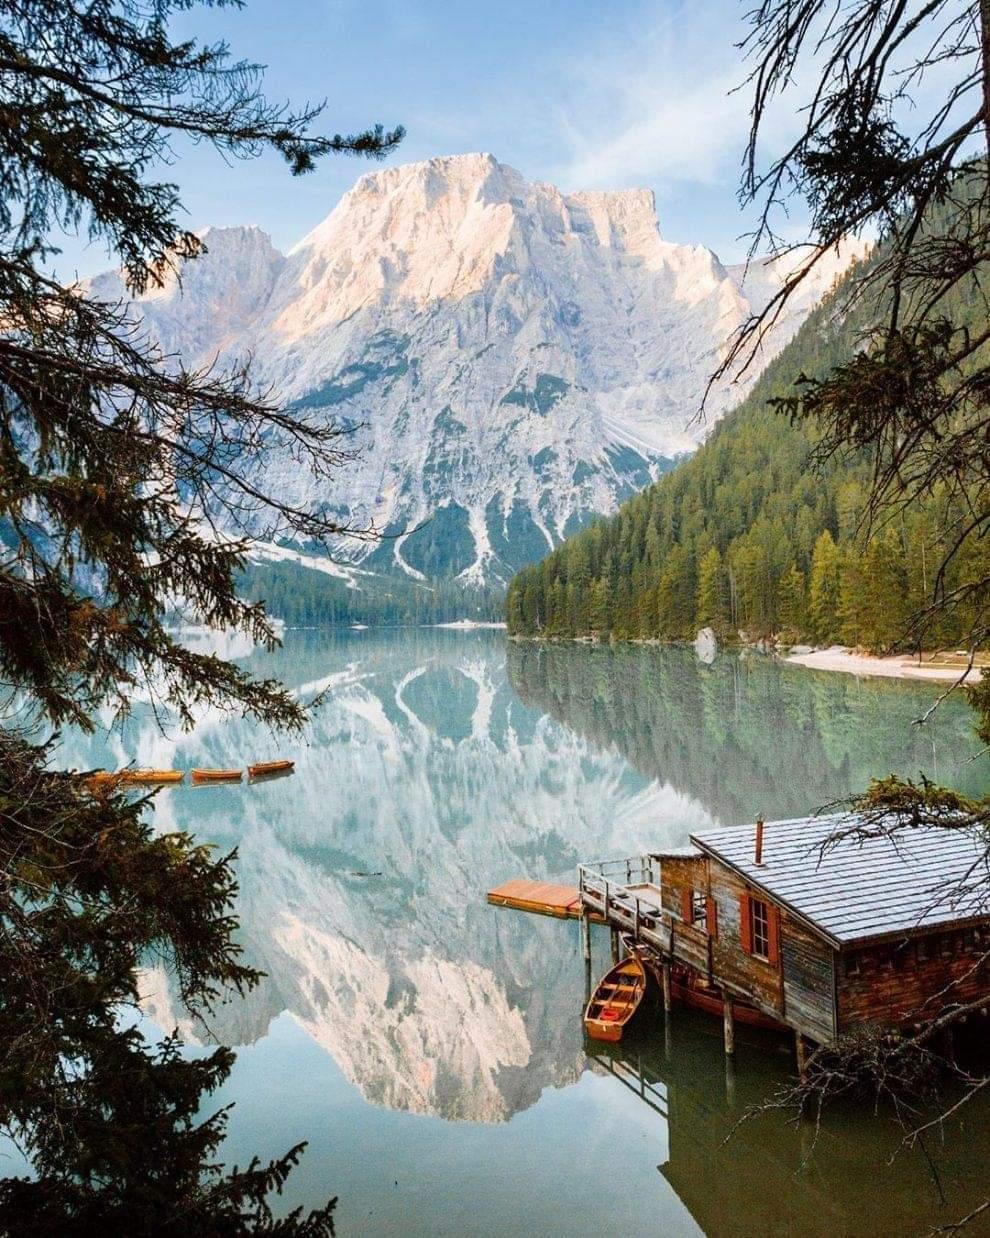 Wonderful Travel-Inspired Photo Works Of Ryan Resatka (30 Pics)